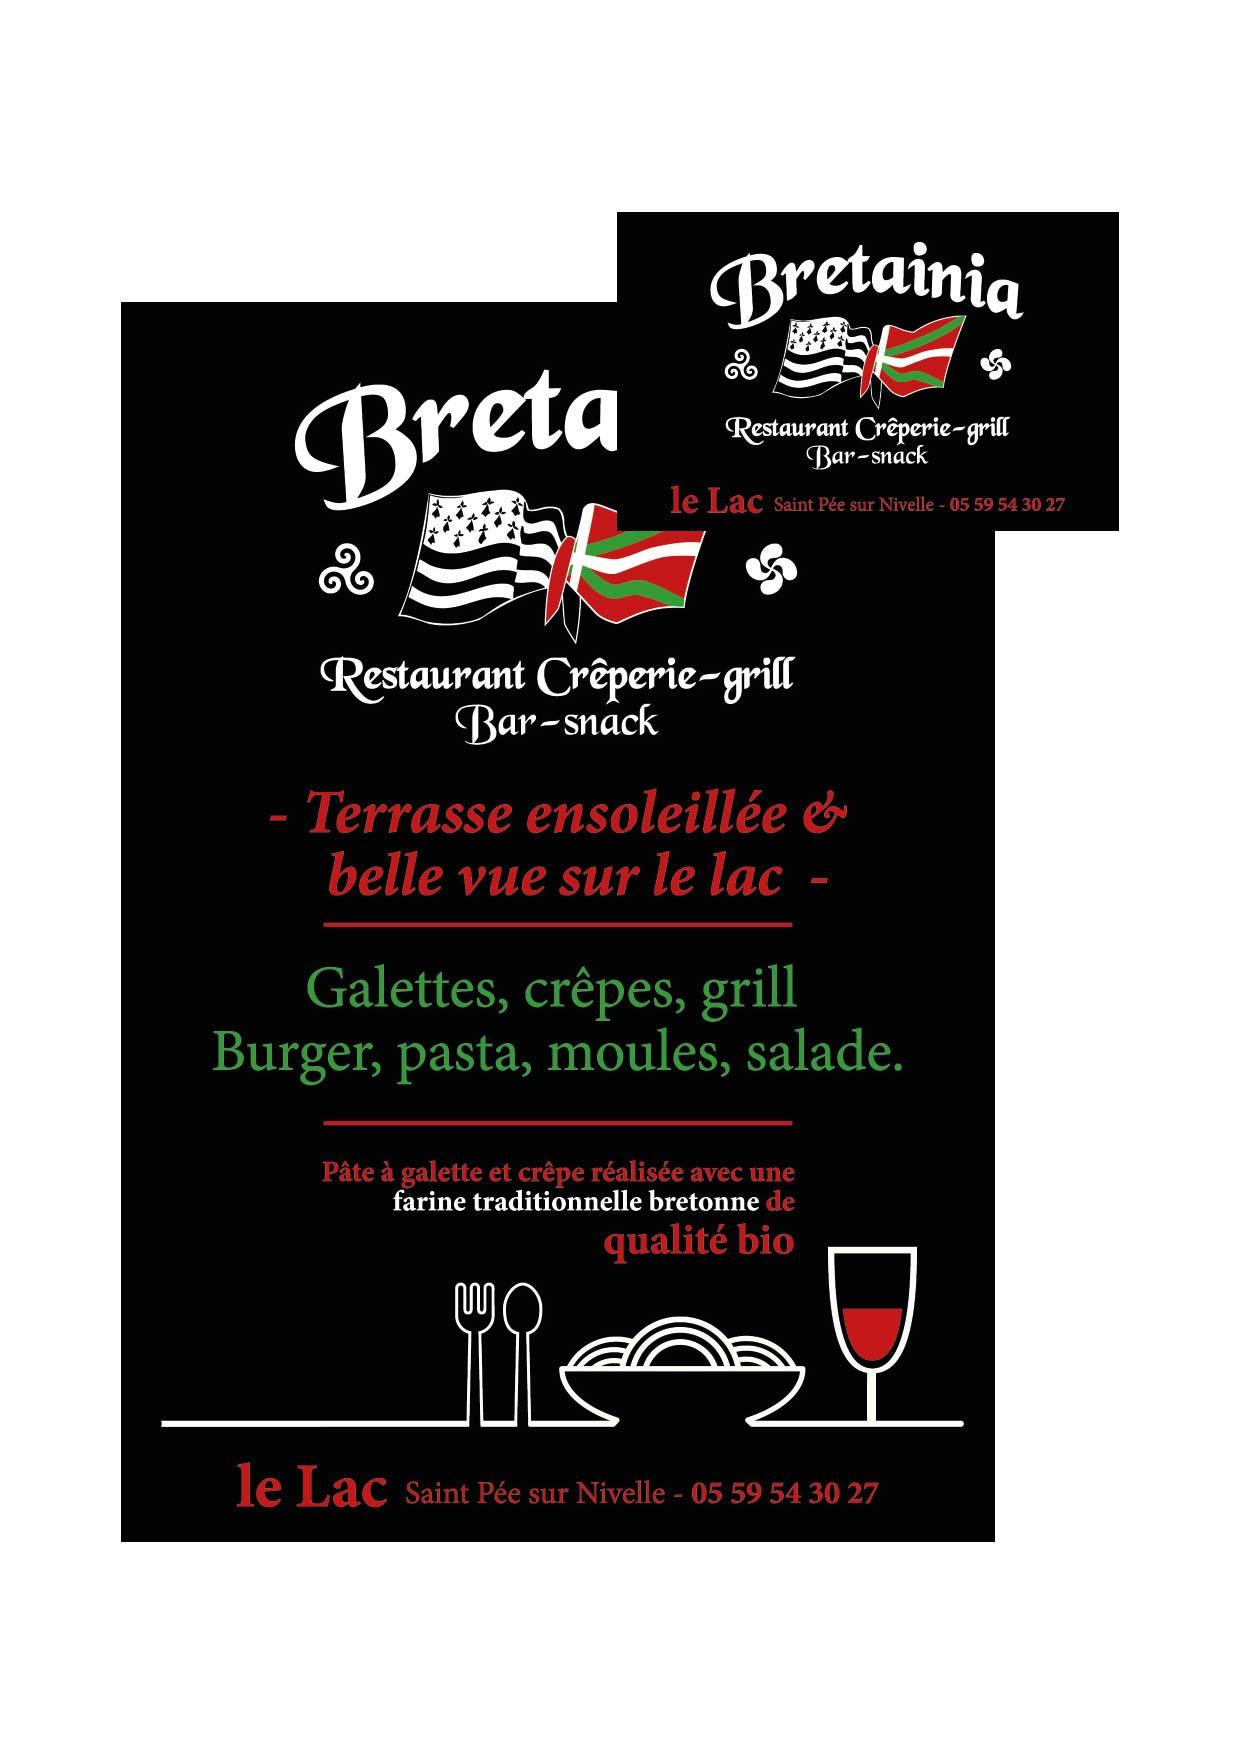 Creation Dun Logo Carte De Visite Et Flyer Pour Bretainia